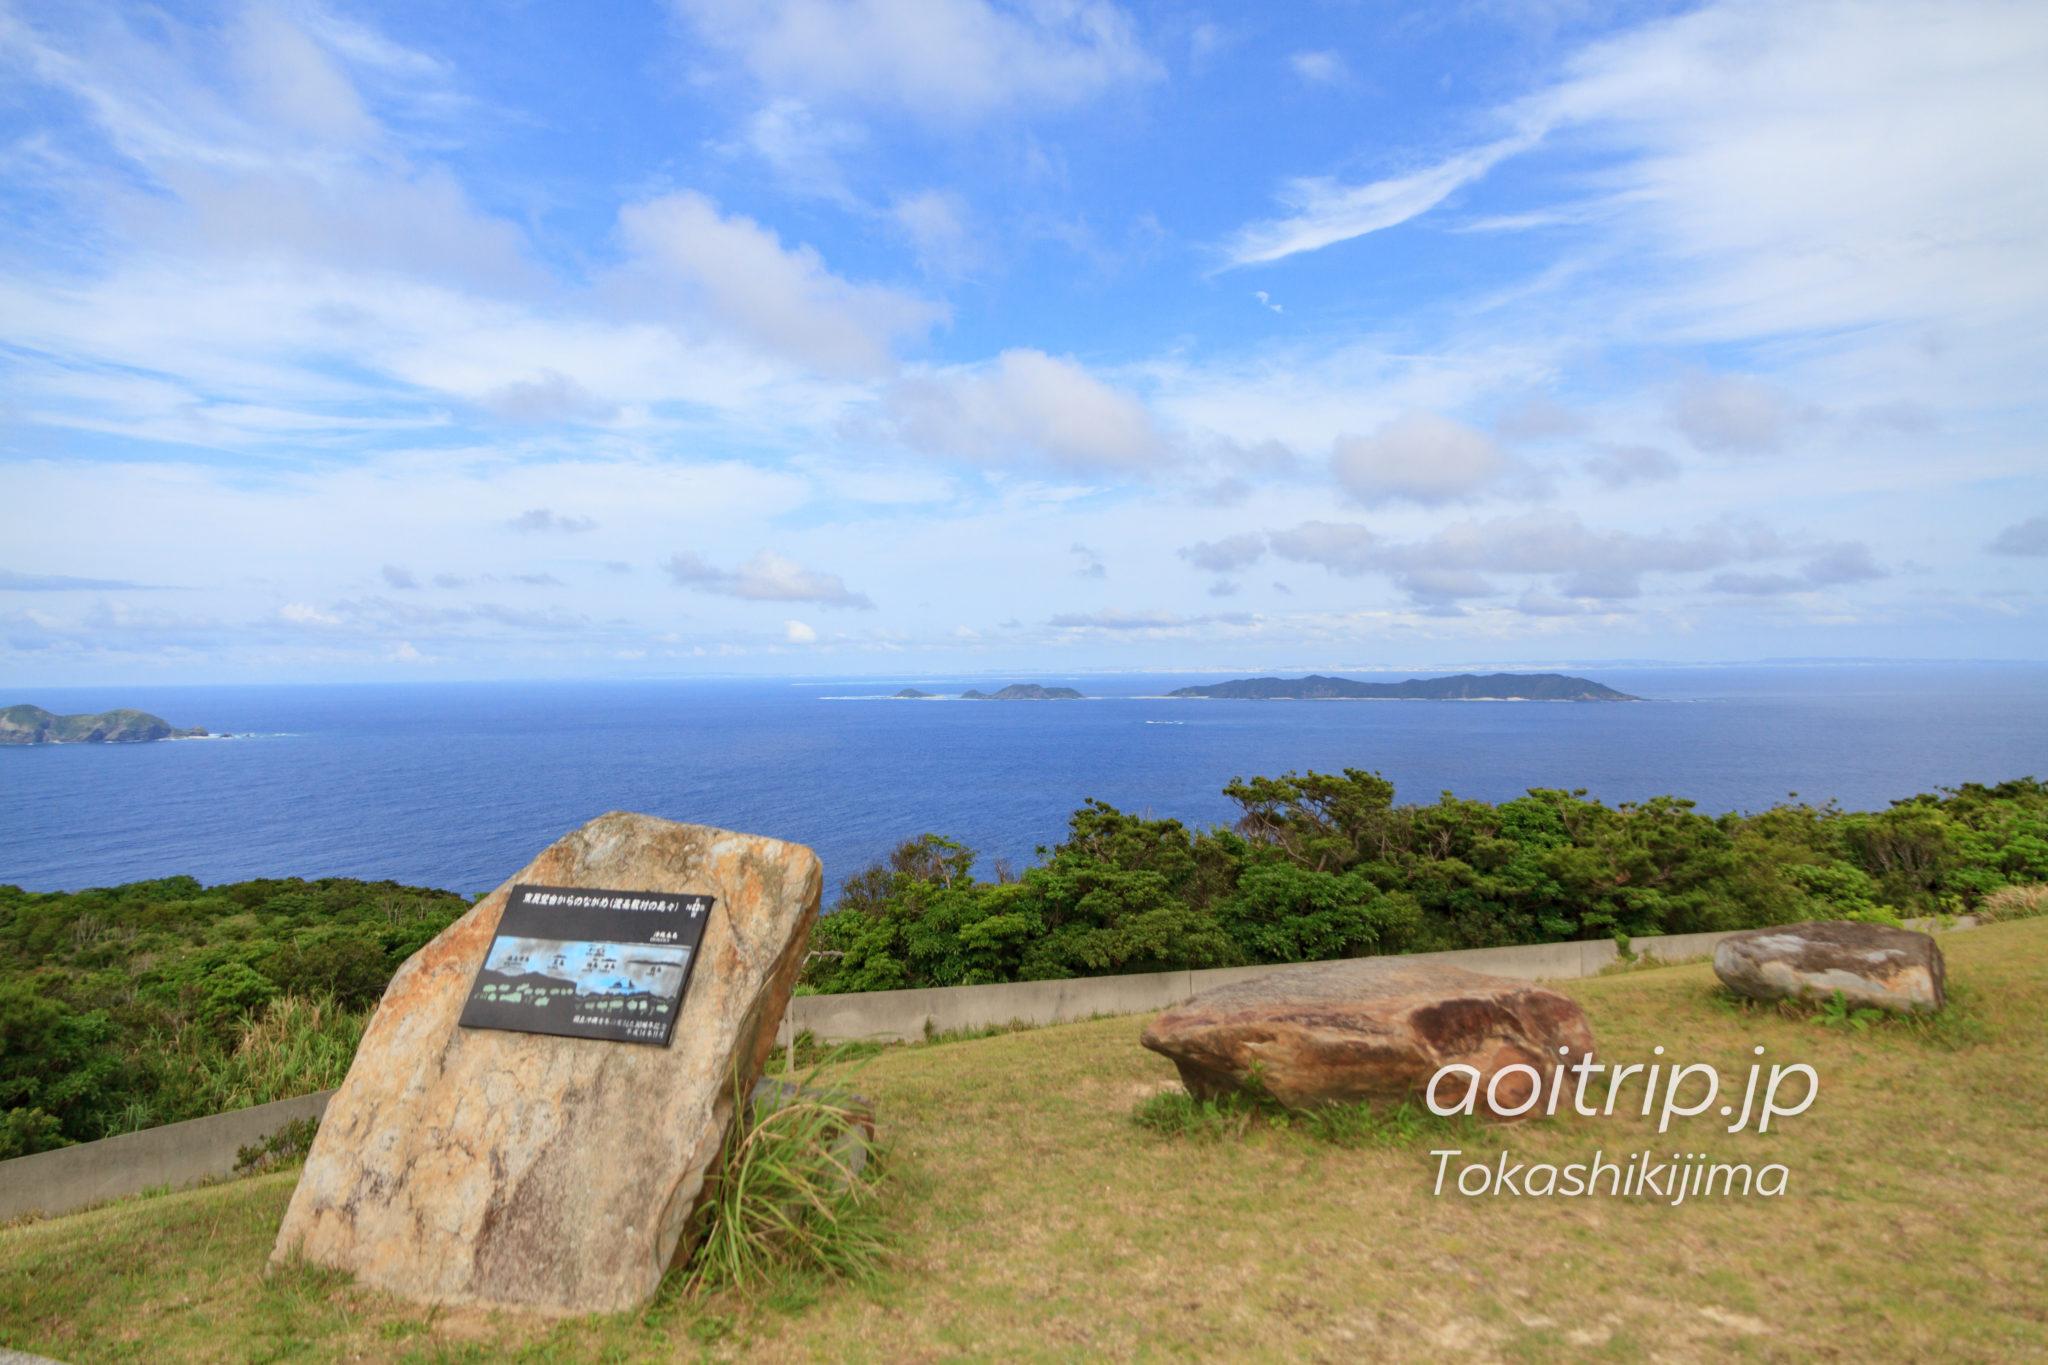 渡嘉敷島の赤間山展望台